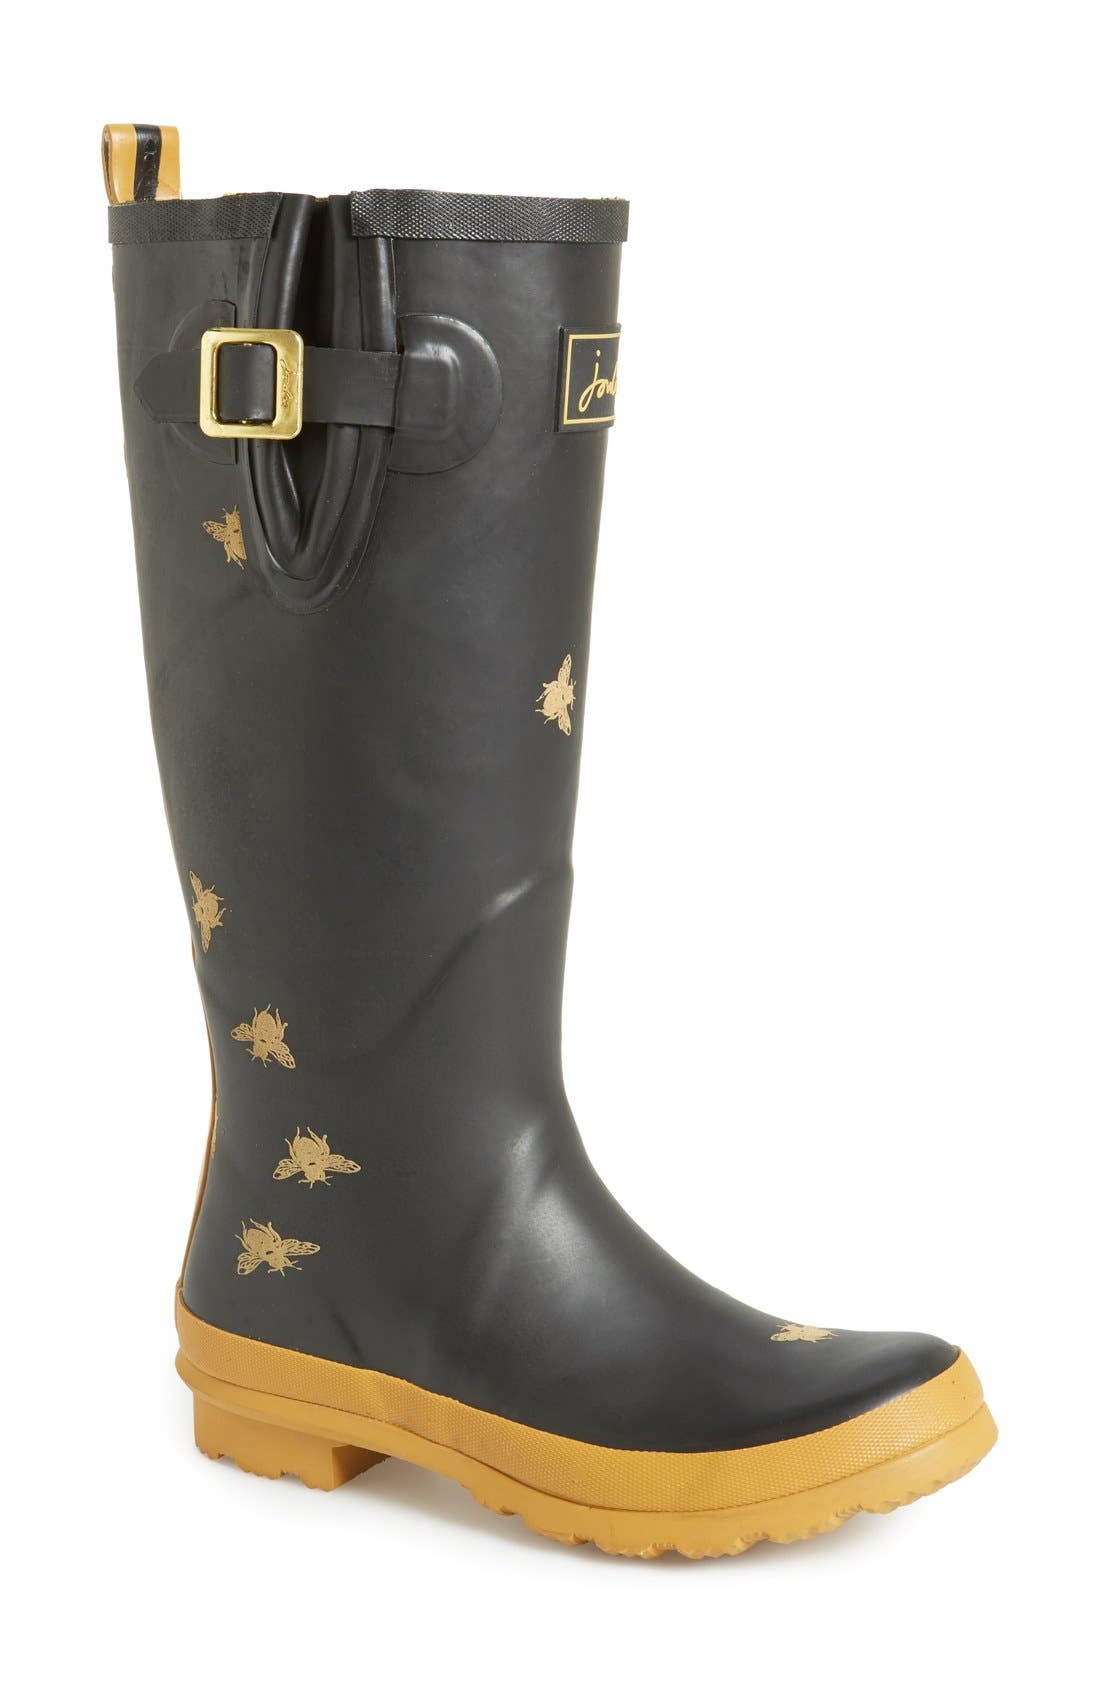 Main Image - Joules 'Wellyprint' Rain Boot (Women)